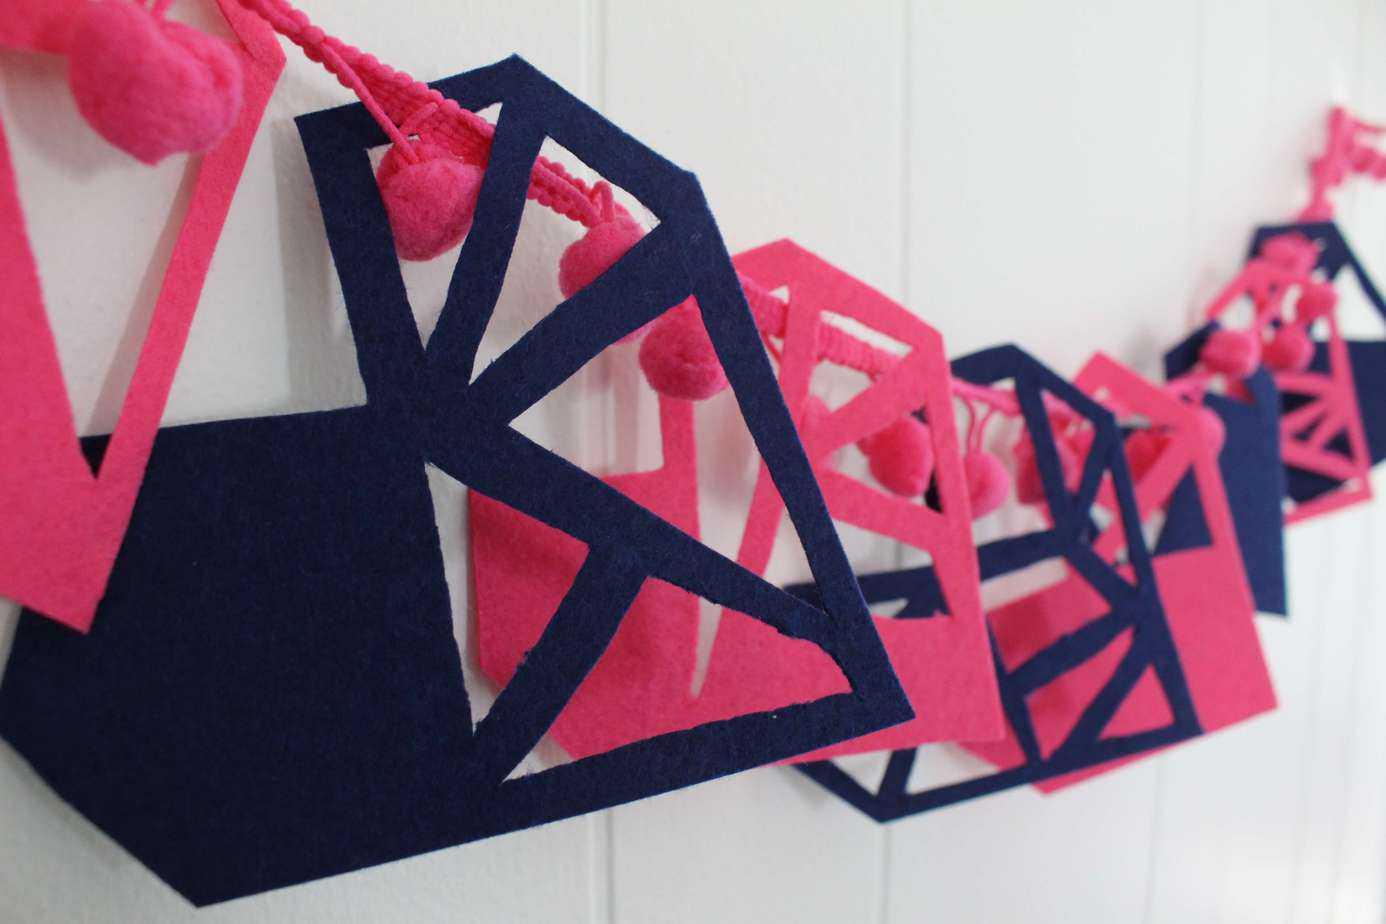 diy geometric valentines garland valentines crafts geometric hearts wwwmadewithhappycom